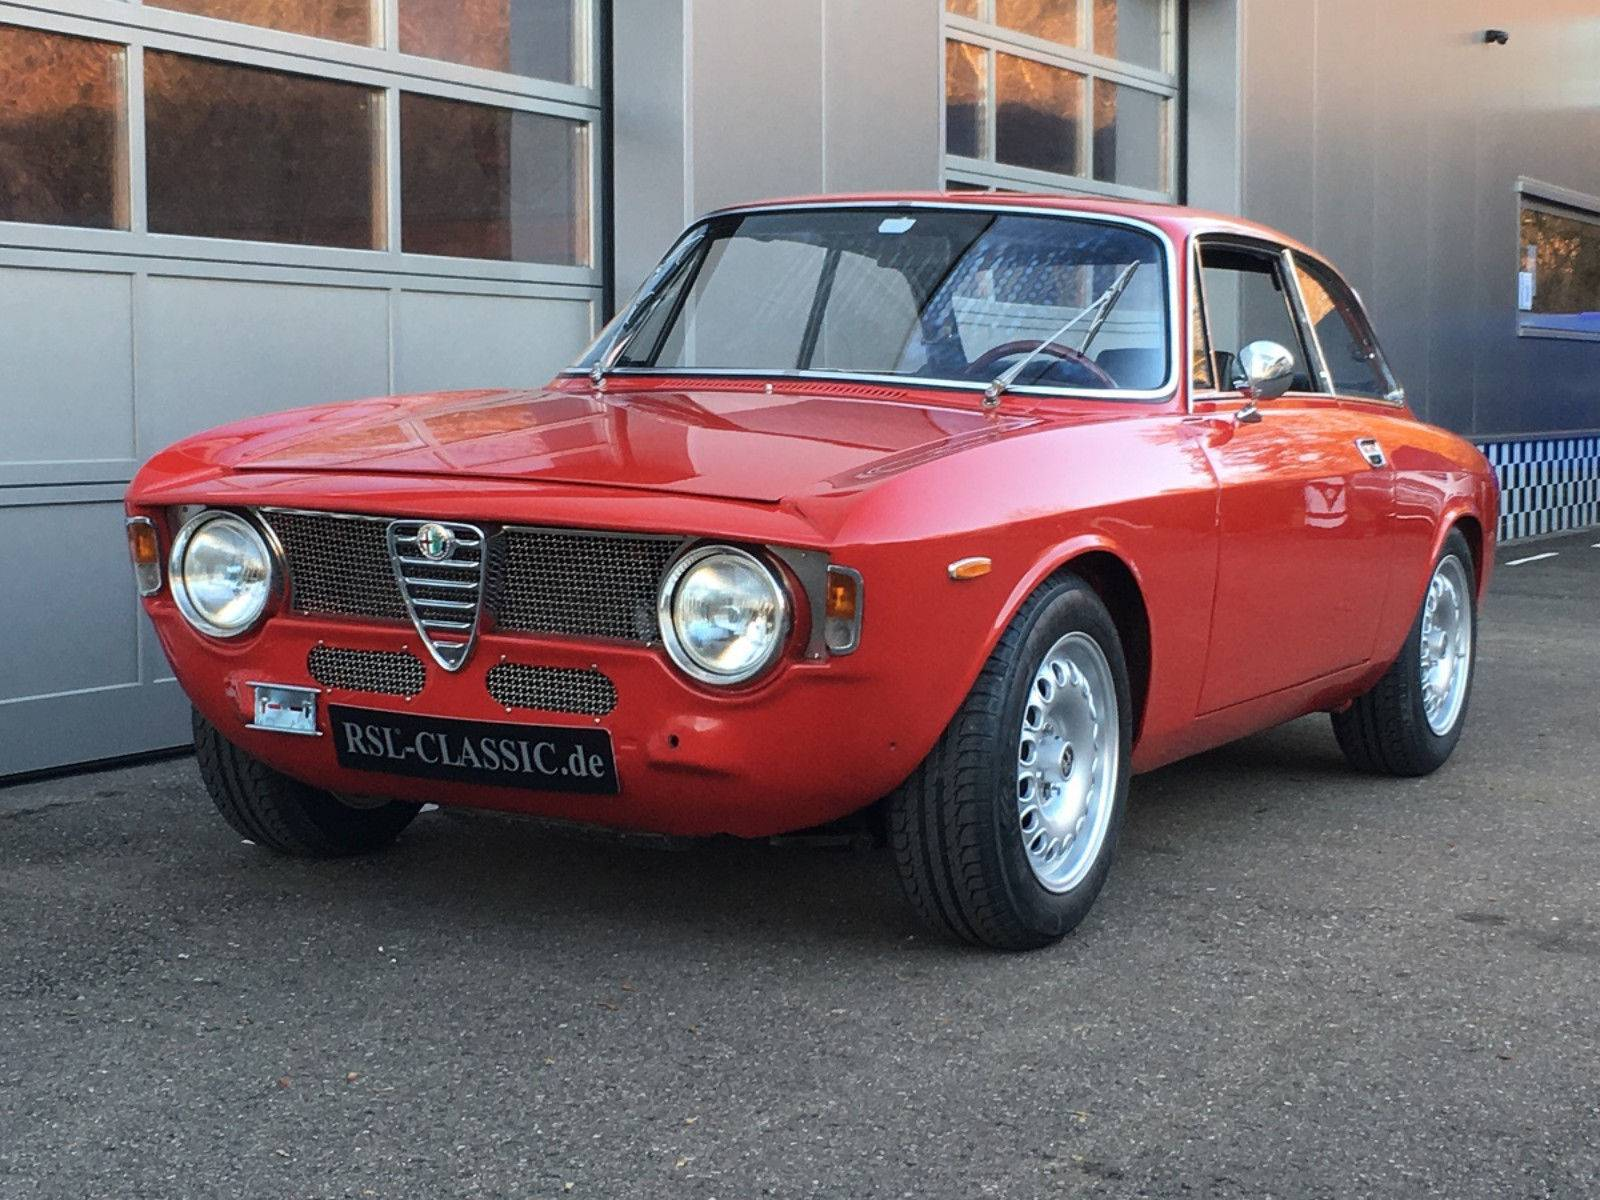 For Sale: Alfa Romeo Giulia GTA 1300 Junior (1969) Offered